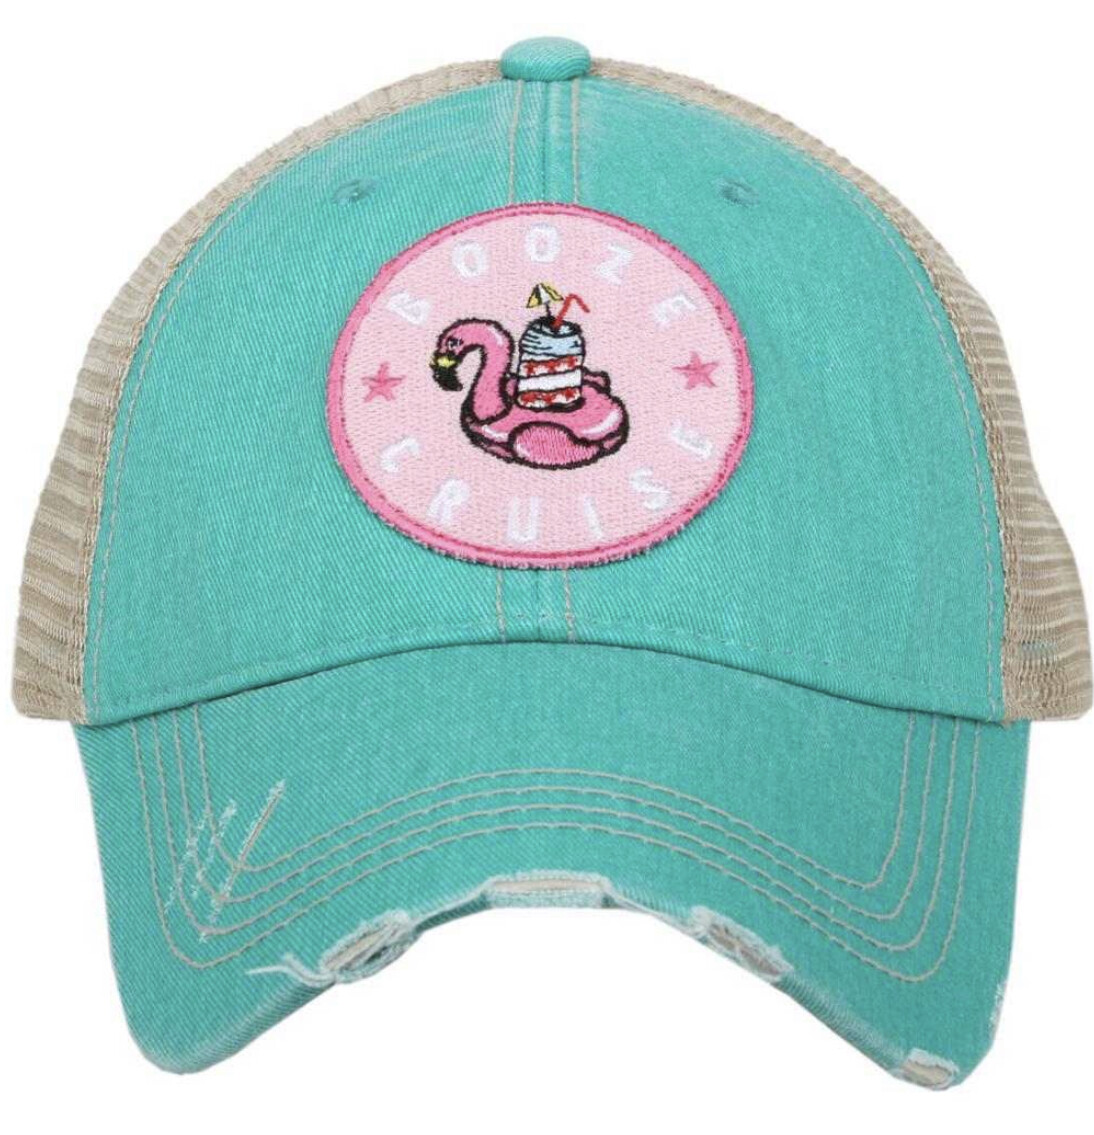 Booze Cruise Circle Patch Trucker hat